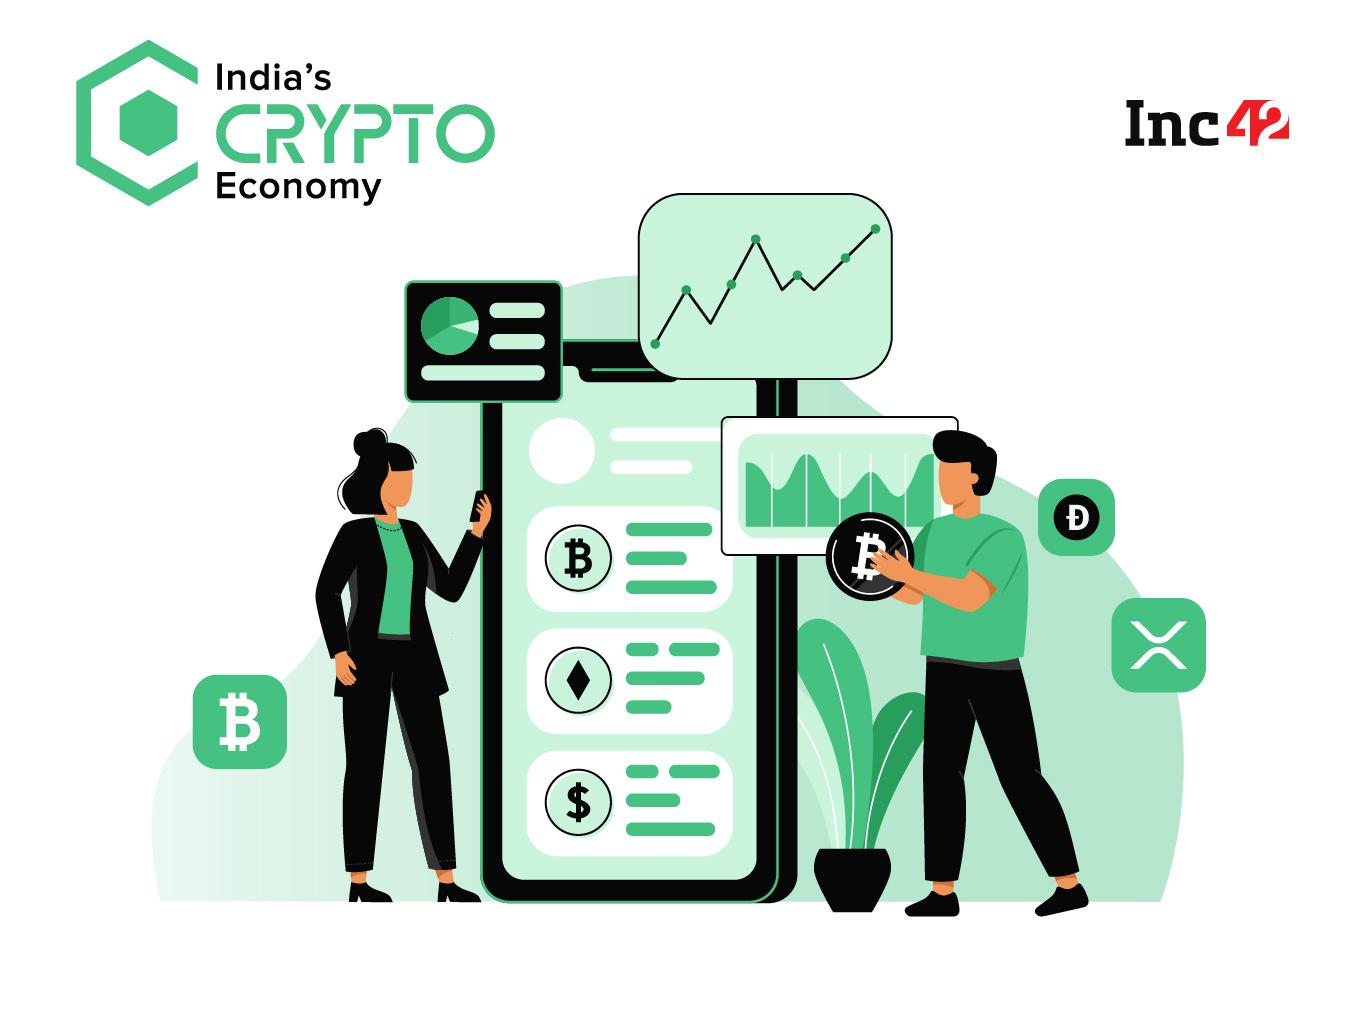 India's Crypto Economy | Crypto's Dark Web Problem